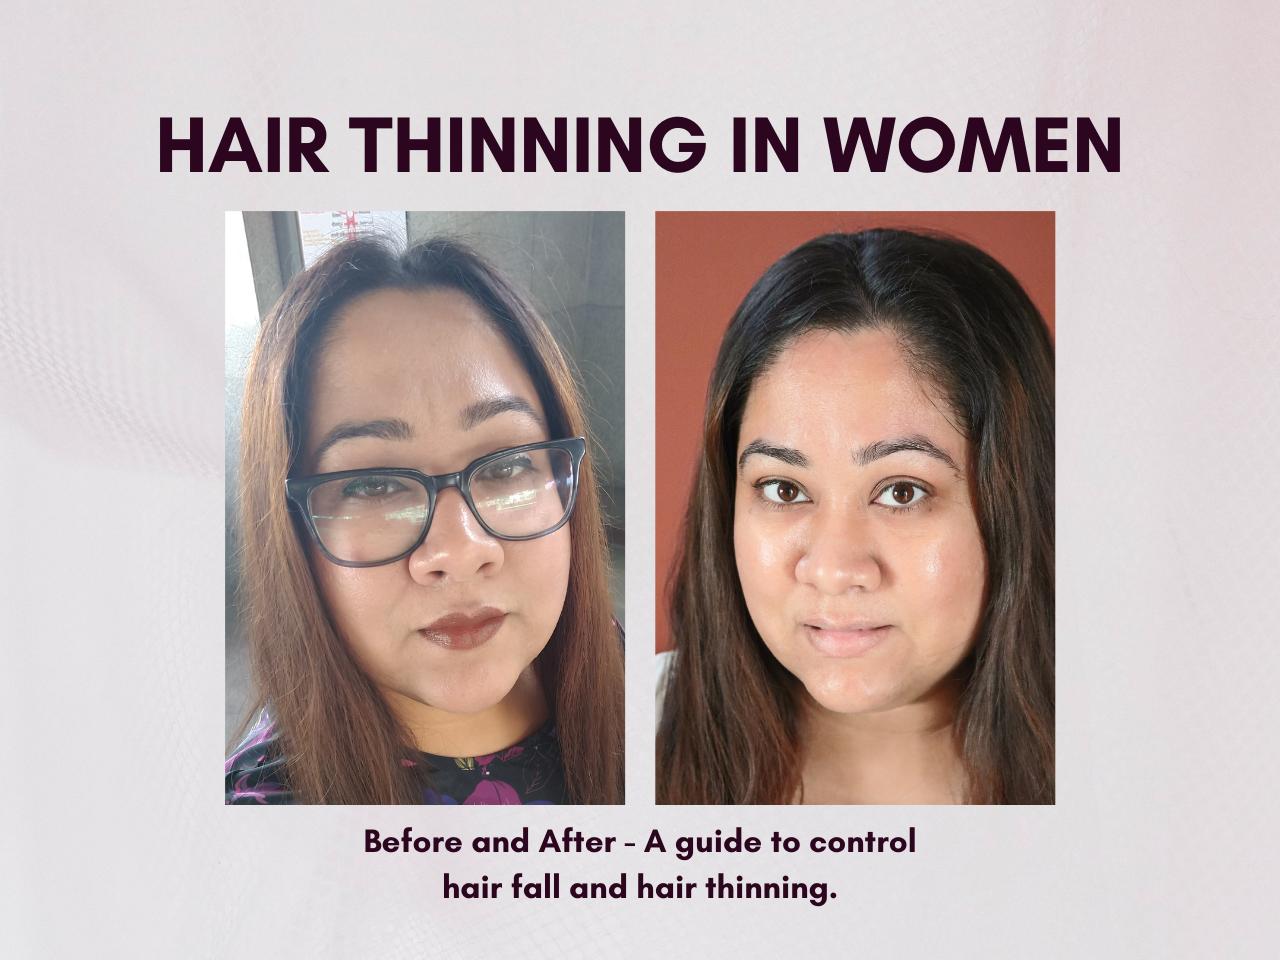 Hair Thinning in Women - Juicy Chemistry